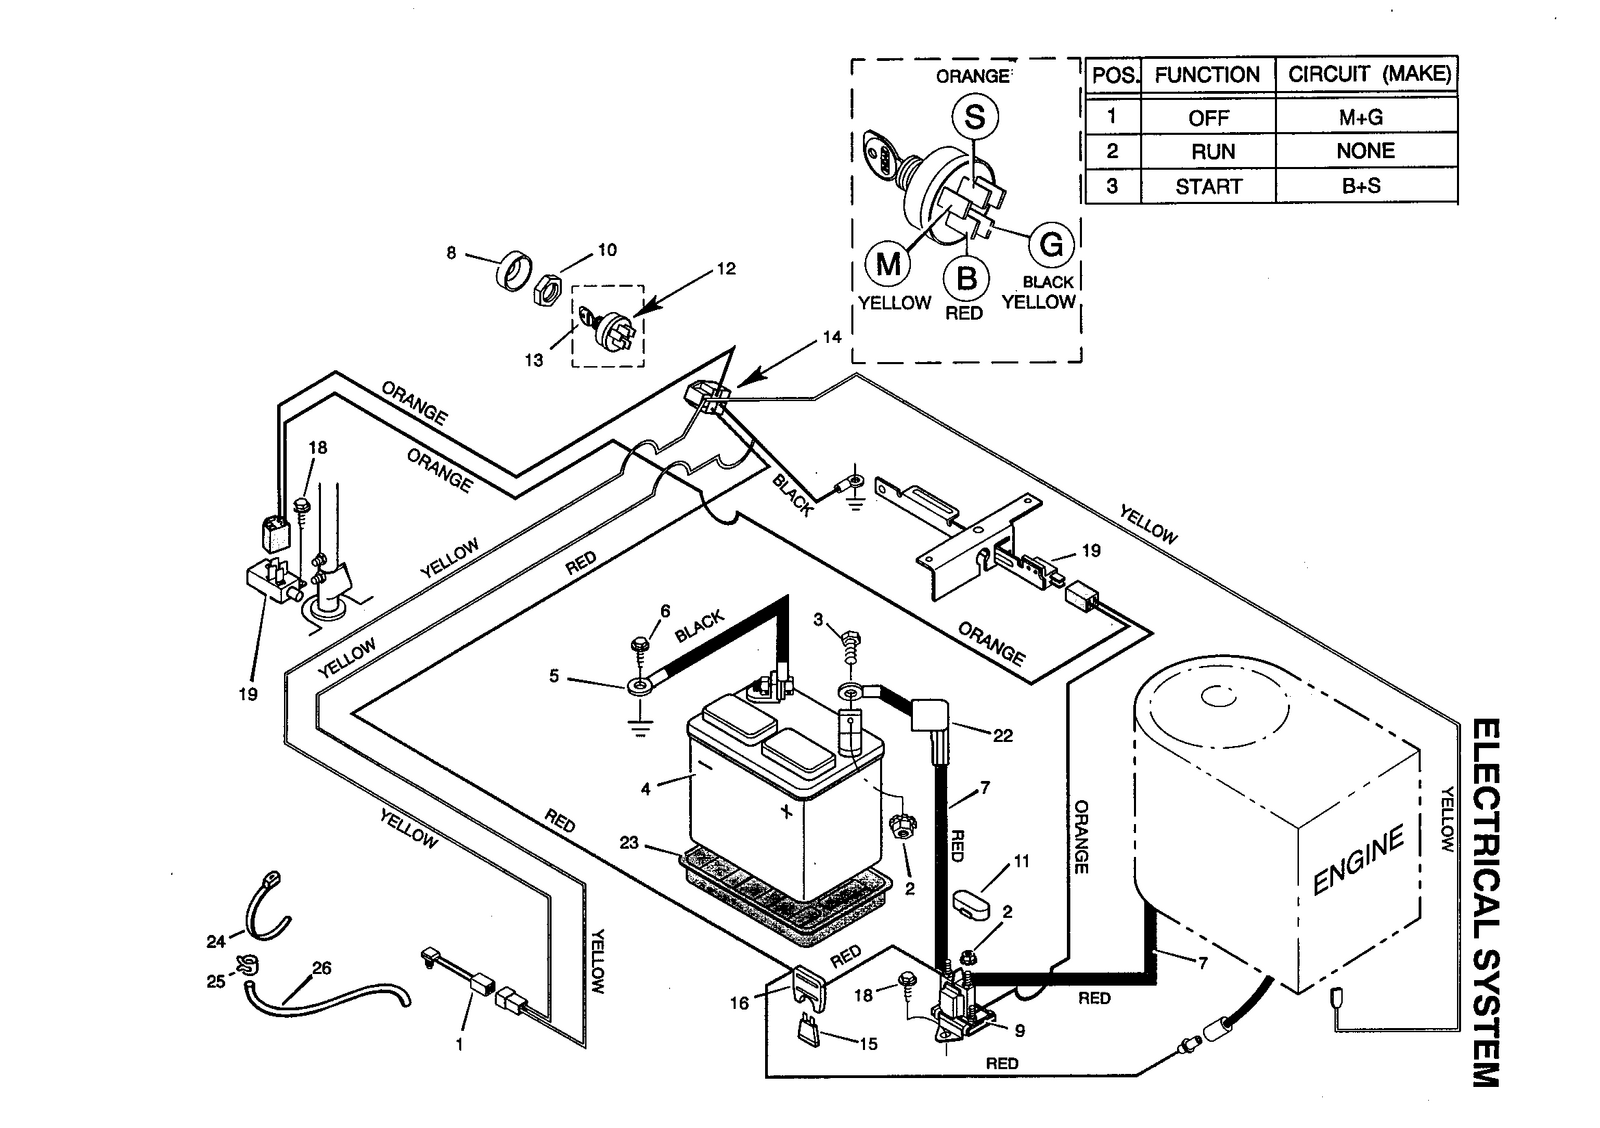 hight resolution of starter solenoid wiring diagram from battery to solenoid craftsman troy bilt 13av60kg011 wiring diagram